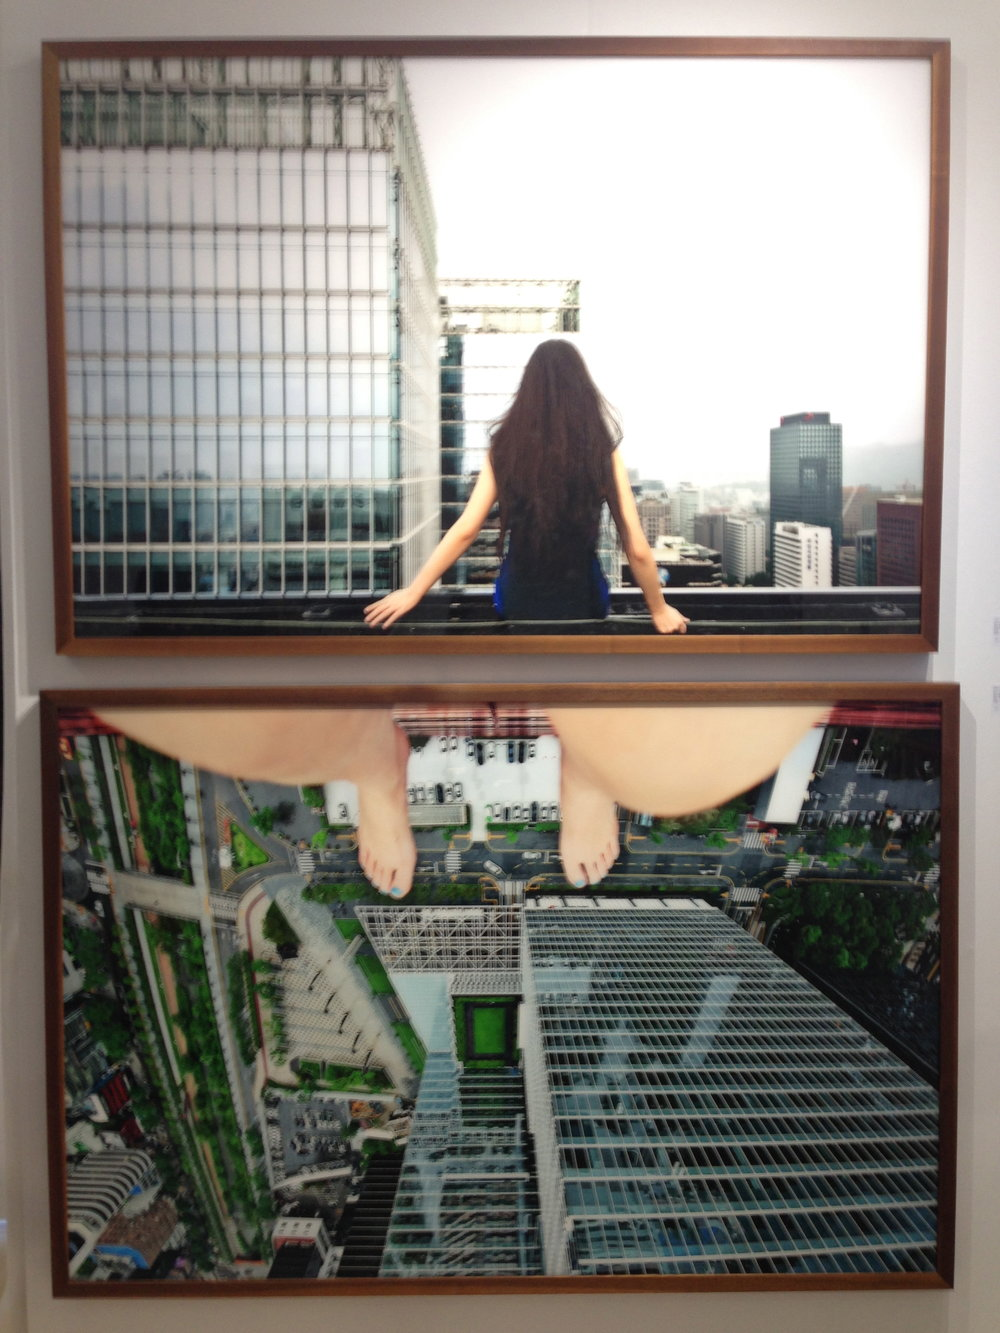 Photography Self-Potrait 2013 by Ahn Jun